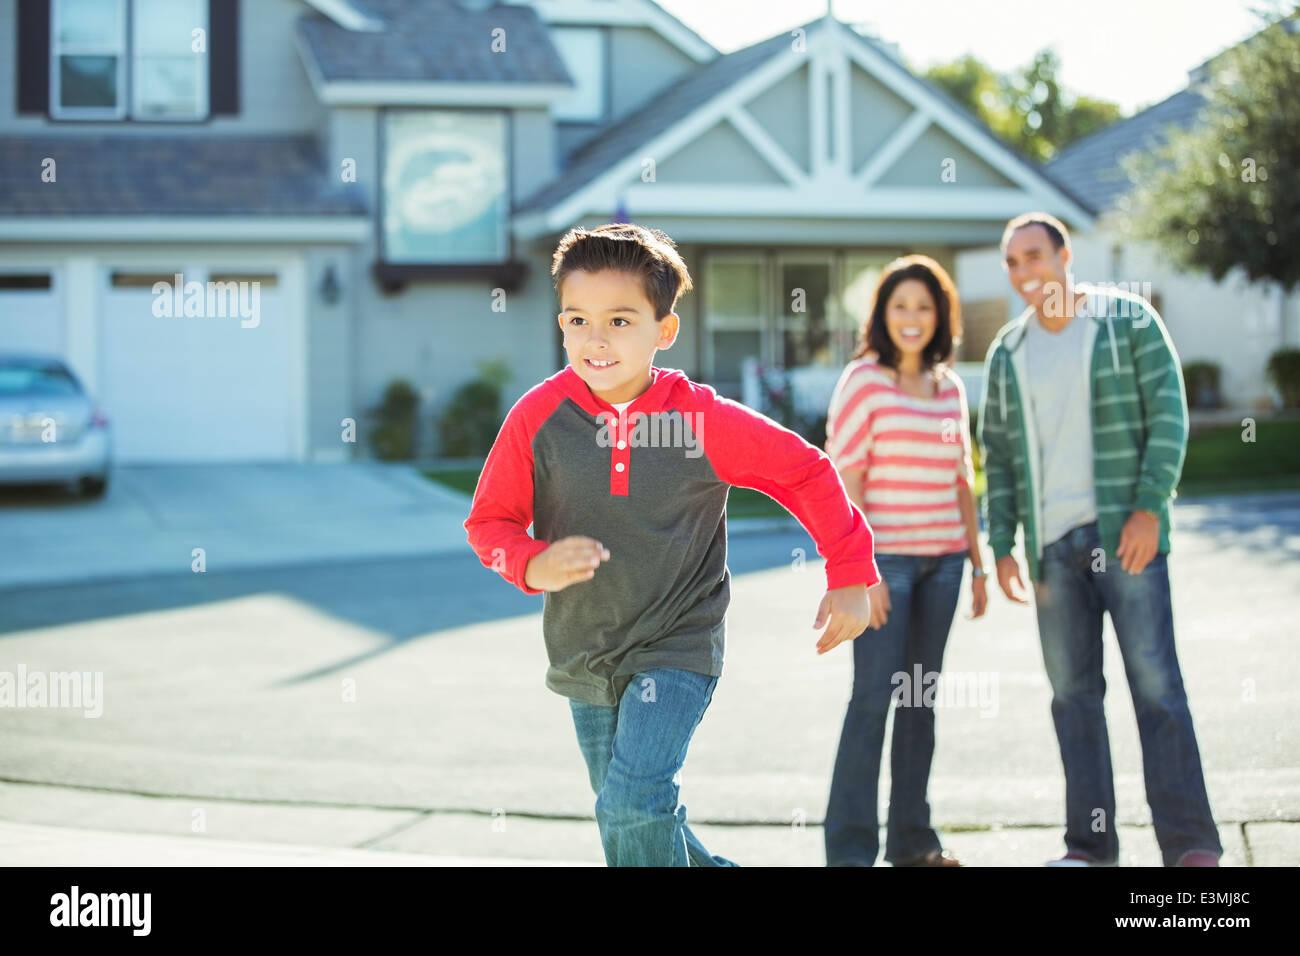 Boy running outdoors Stock Photo